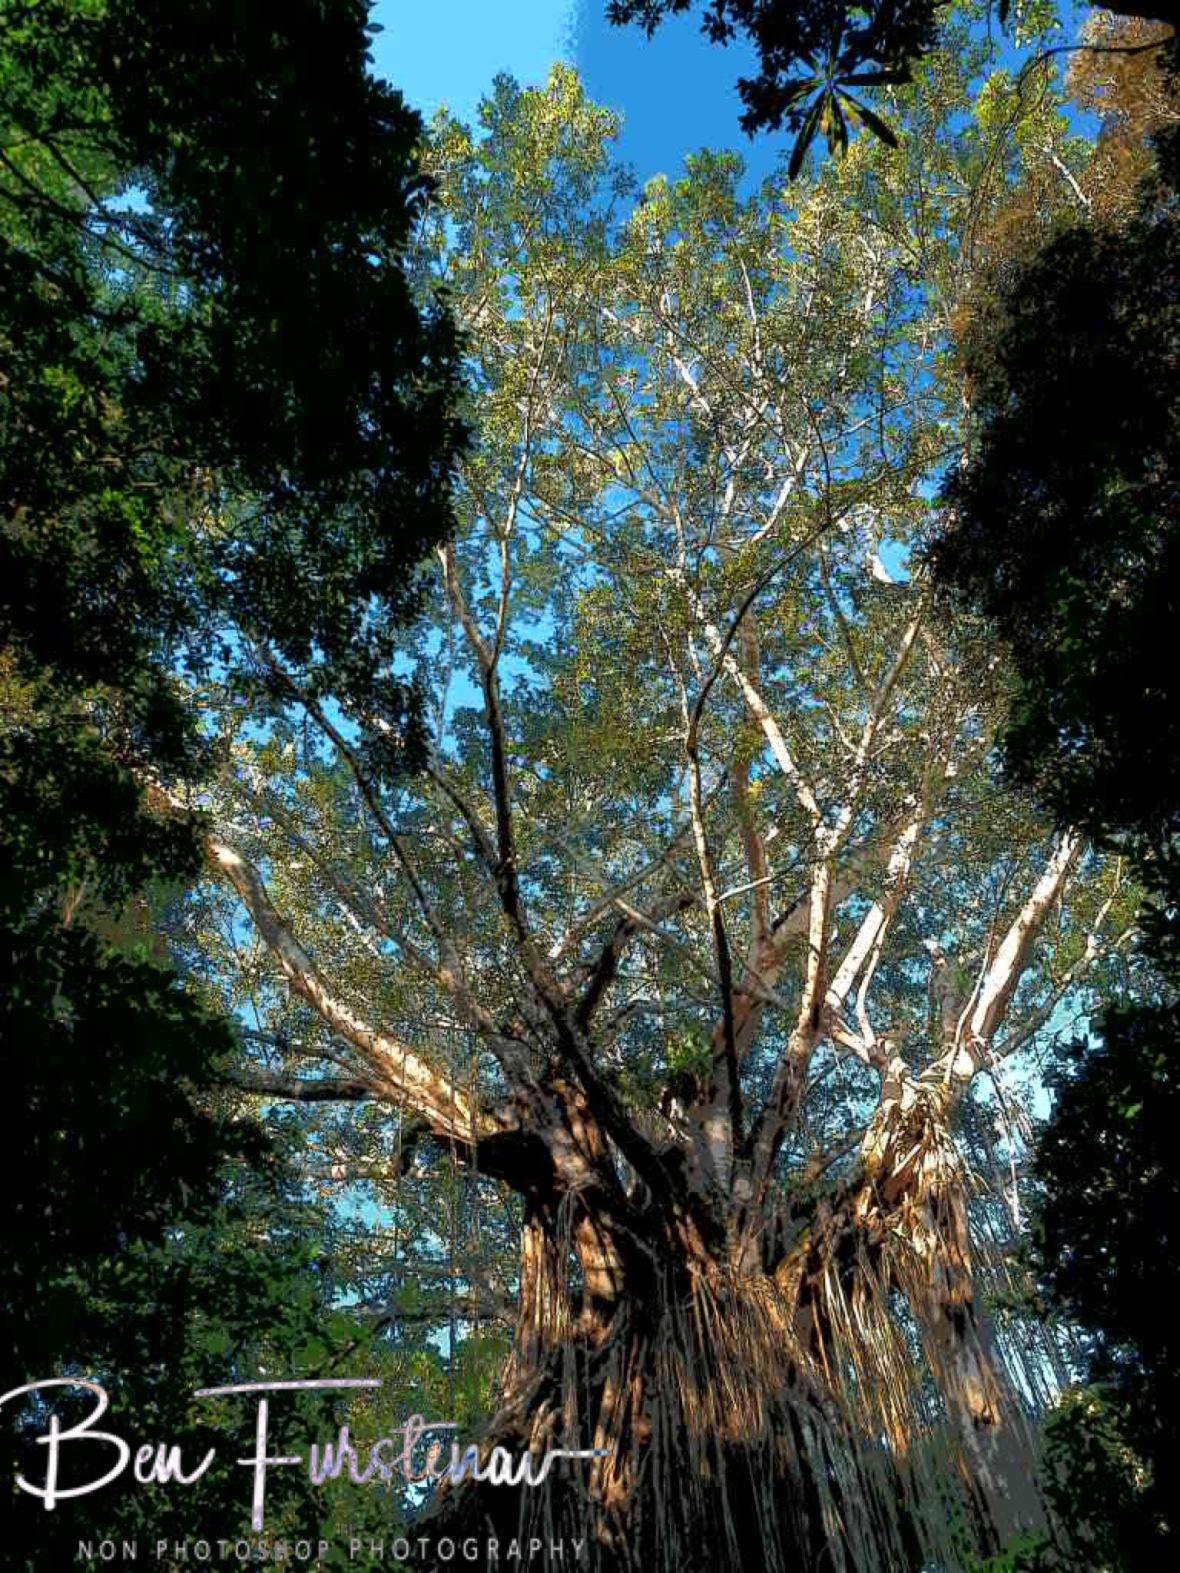 Impressive dimensions, Atherton Tablelands, Far North Queensland, Australia